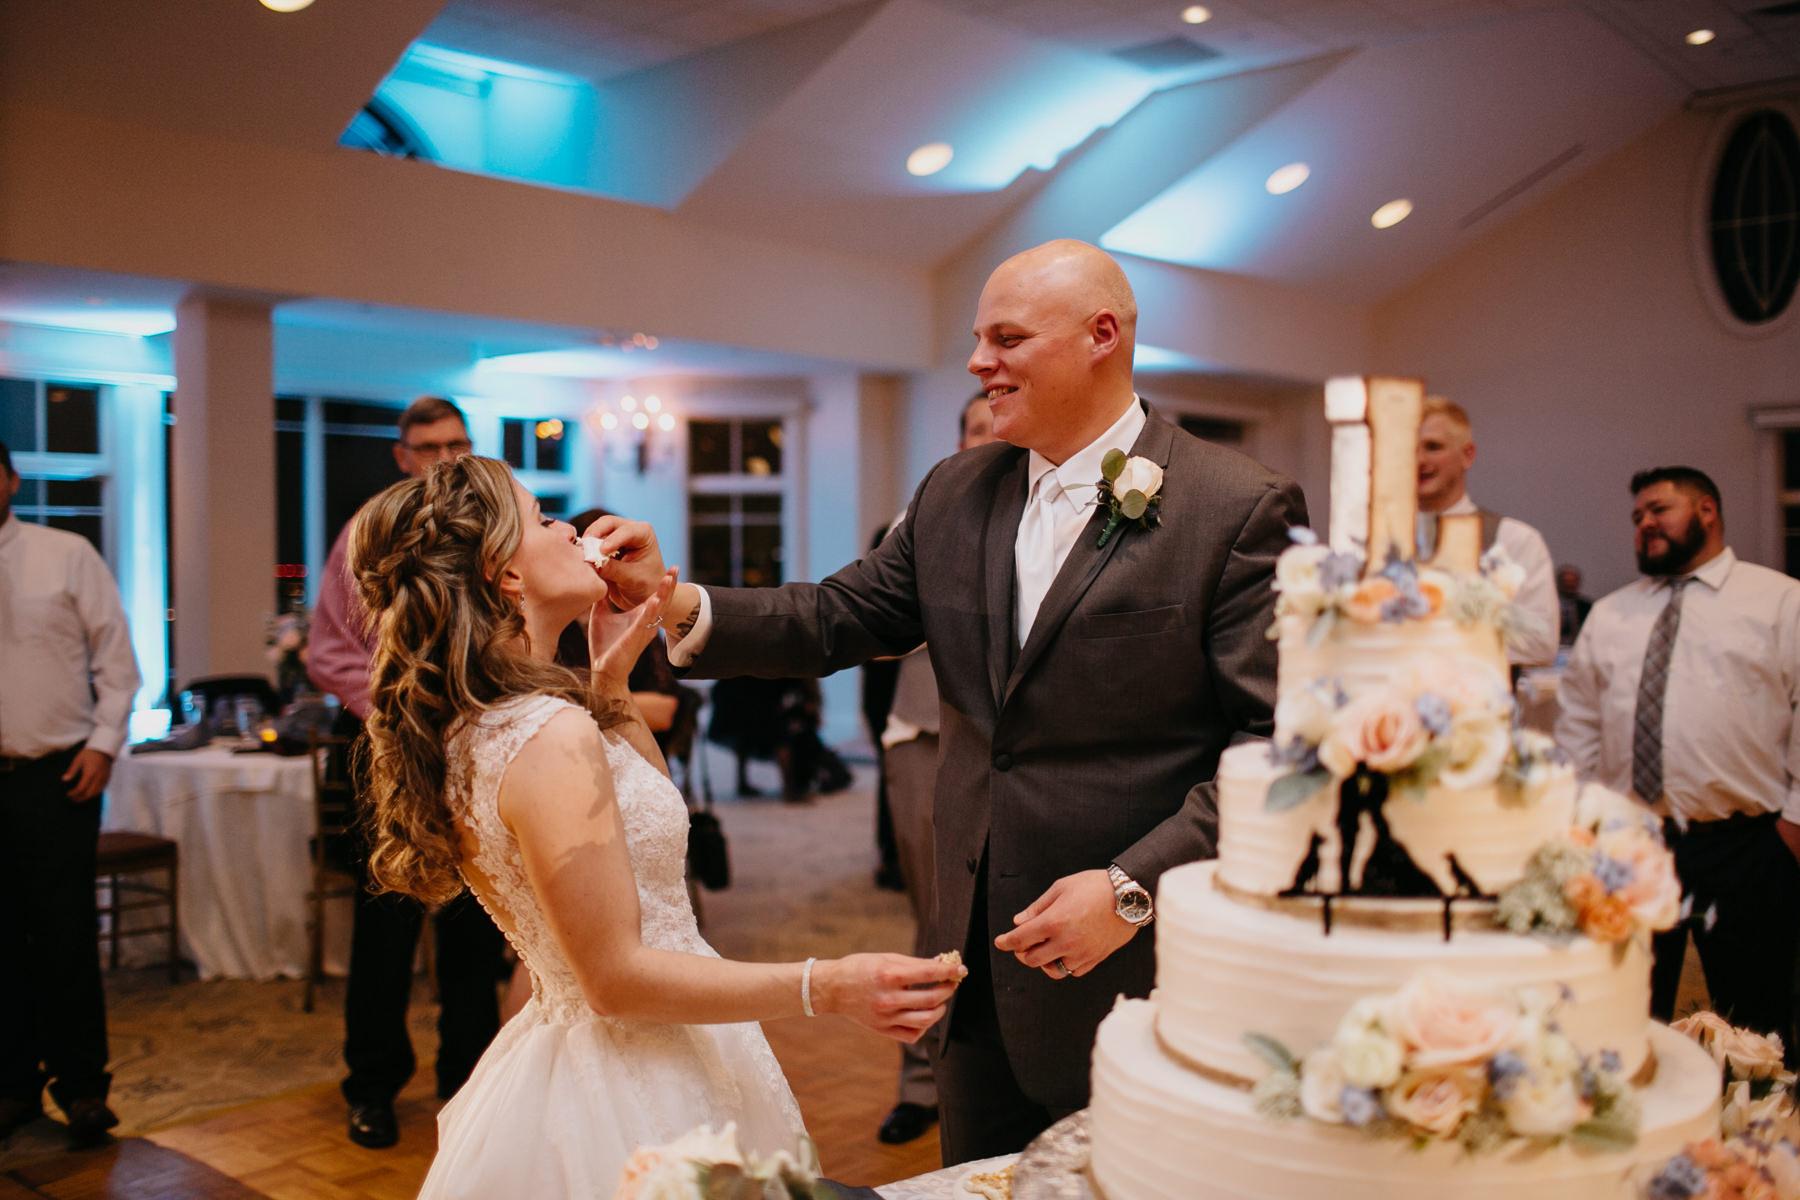 Quincy Ma Massachusetts Wedding Dedham Boston Granie Links Wedding New England Catholic Cathedral Liz Osban Photography 110.jpg